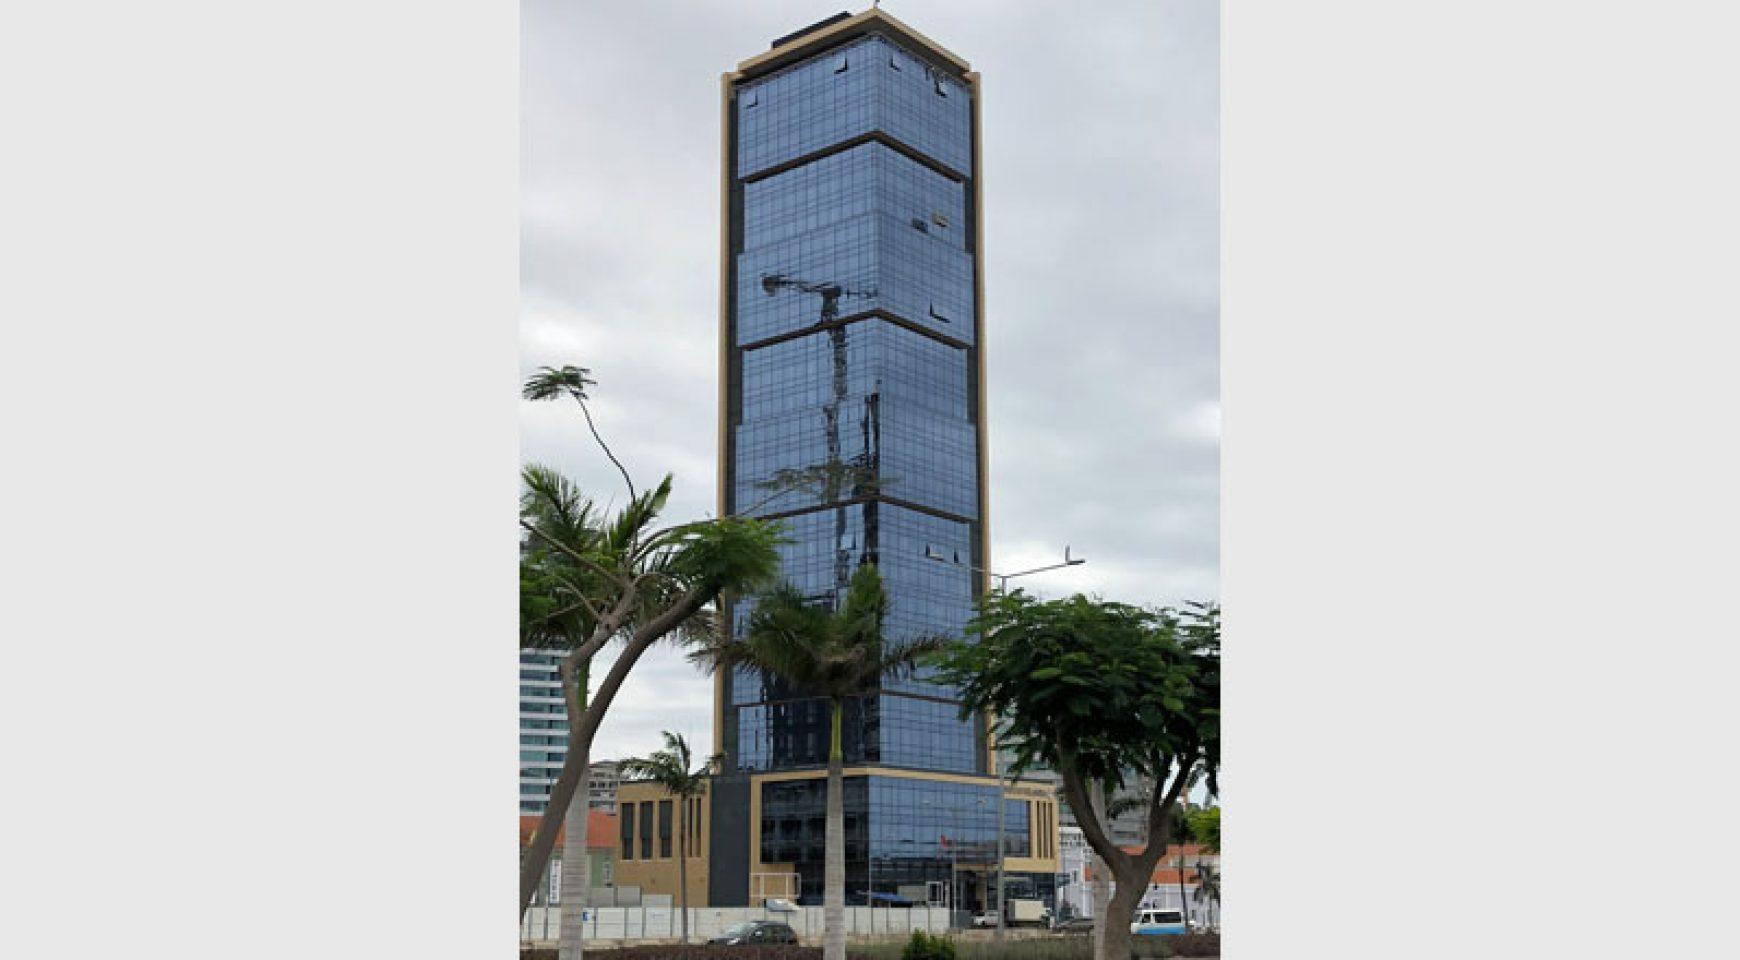 Building a modern home for 100 kila.